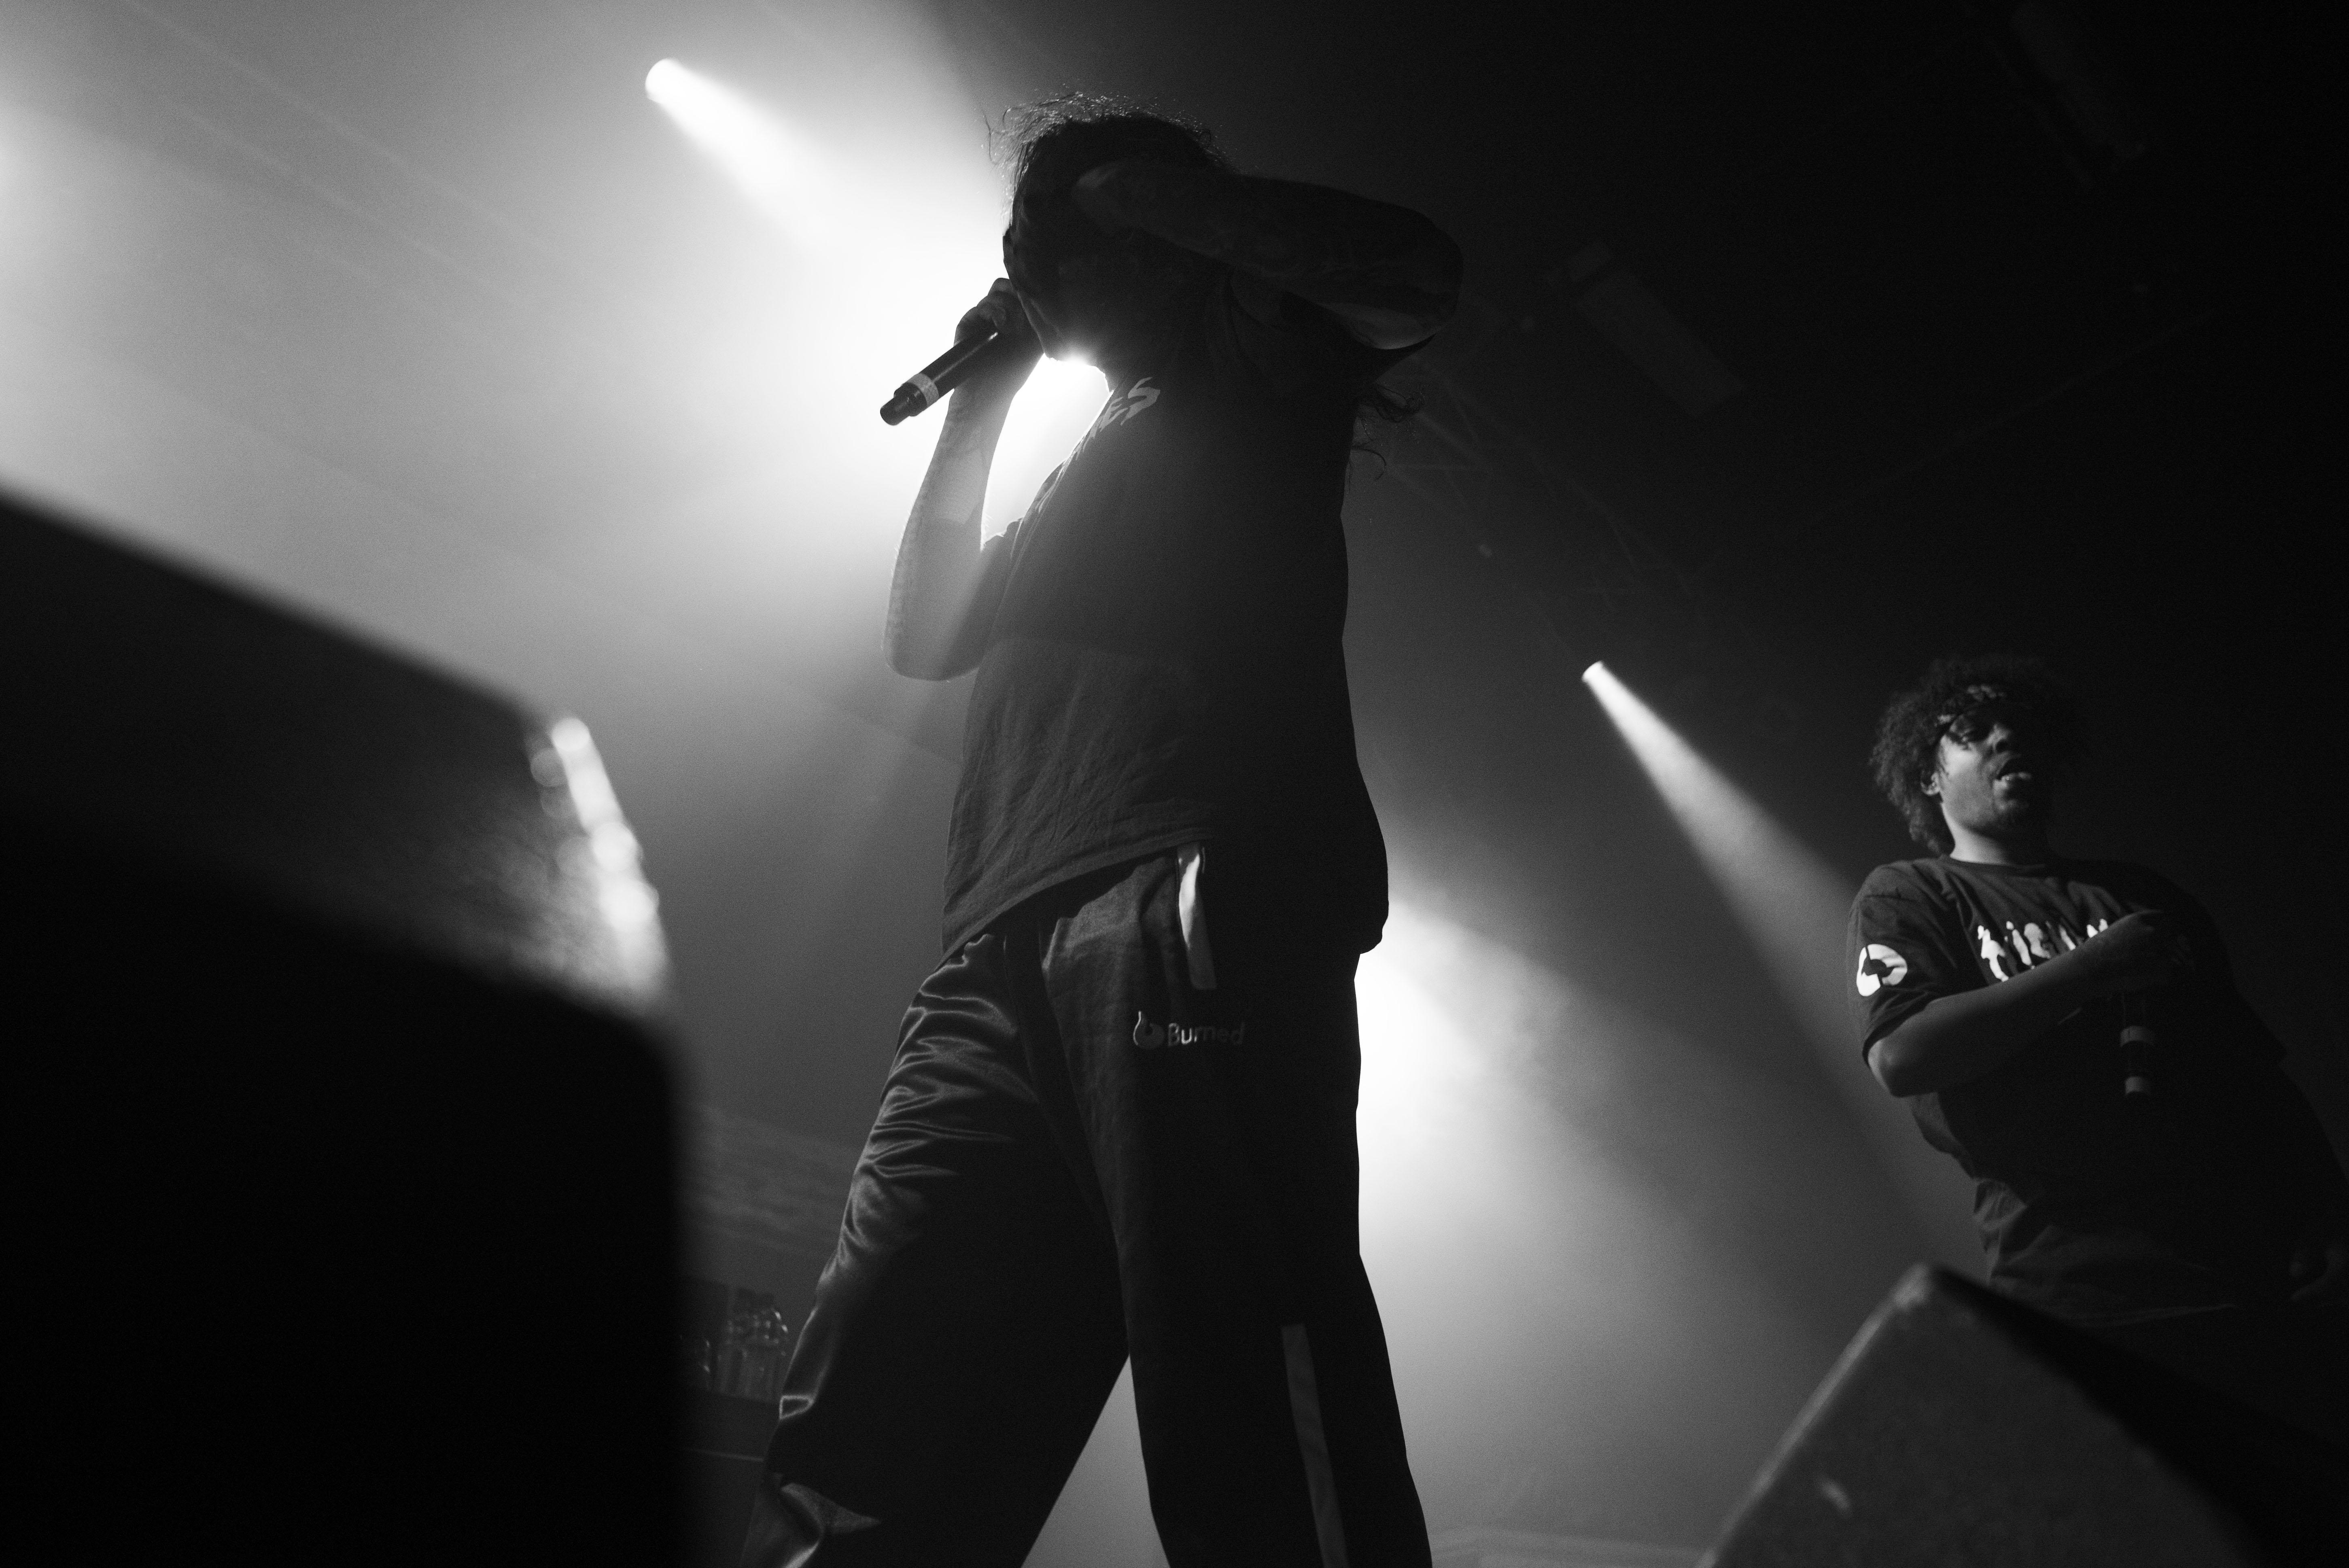 Dope D.O.D. @ Tivoli de Helling, Utrecht - Fotocredits: Shali Blok (ArtiestenNieuws)